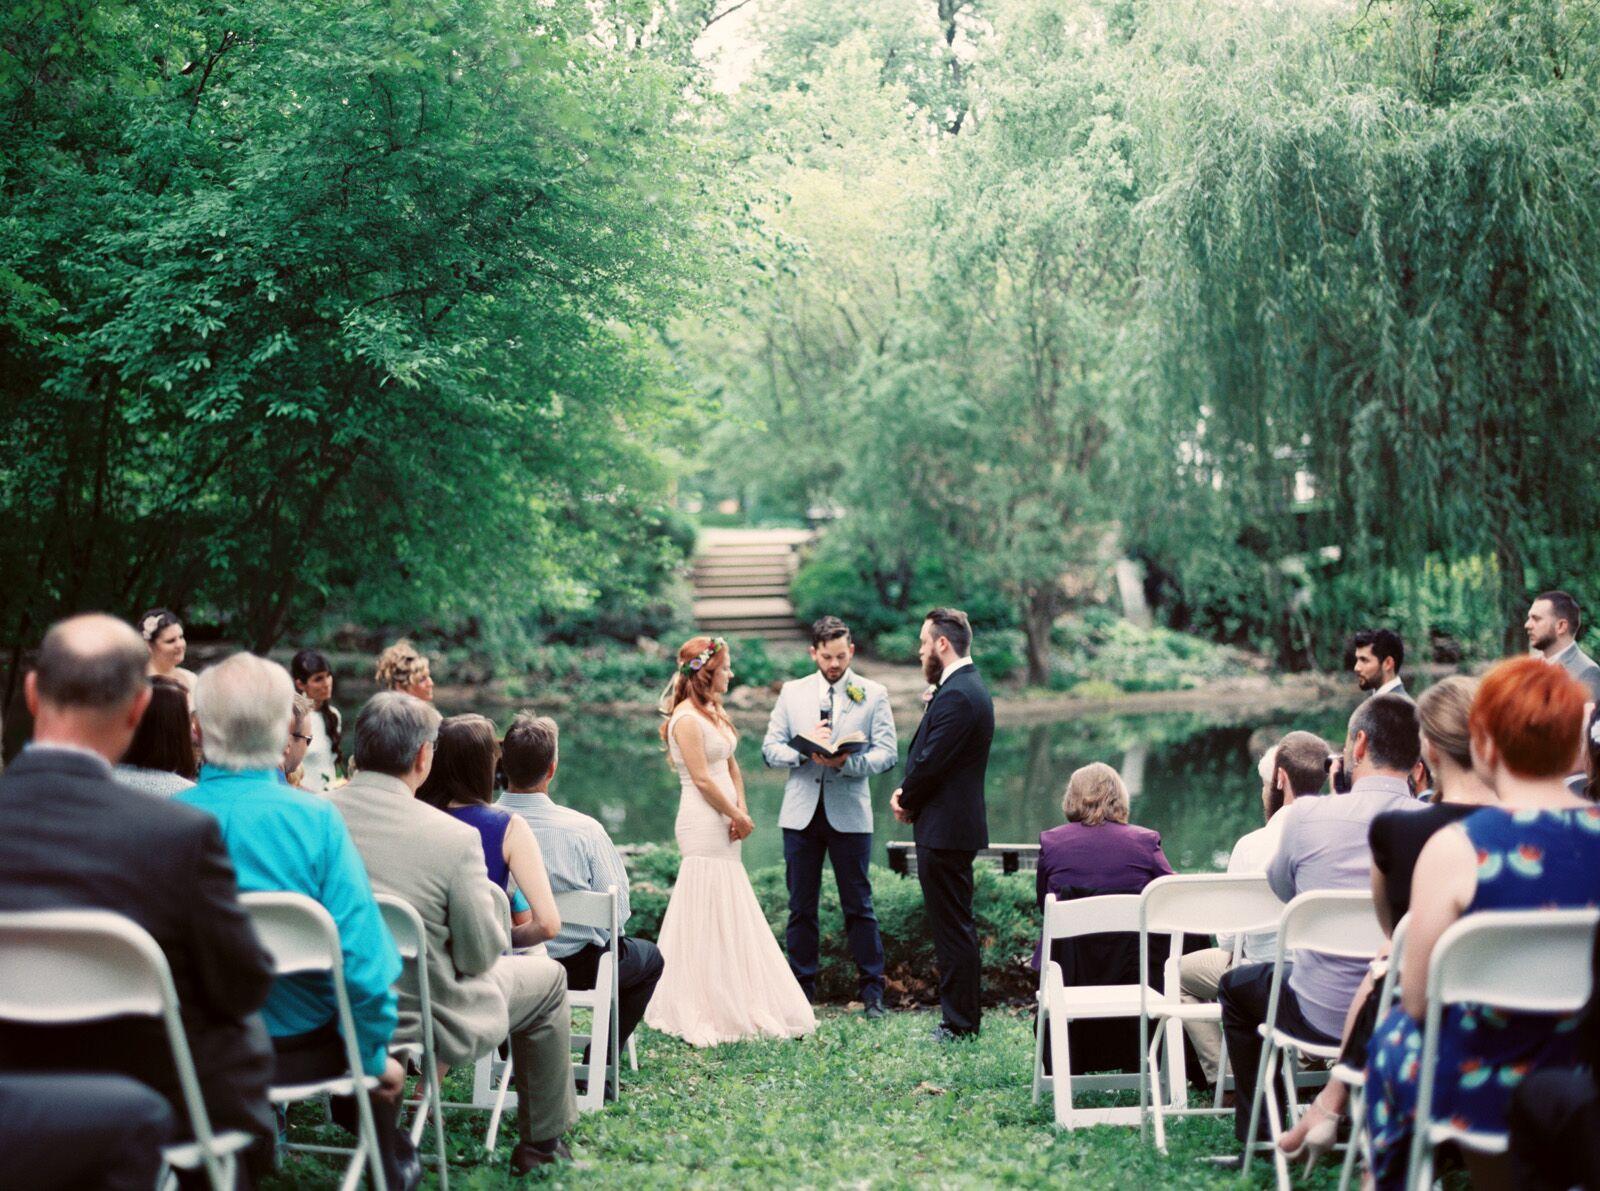 A Lafayette Square Park Wedding Ceremony